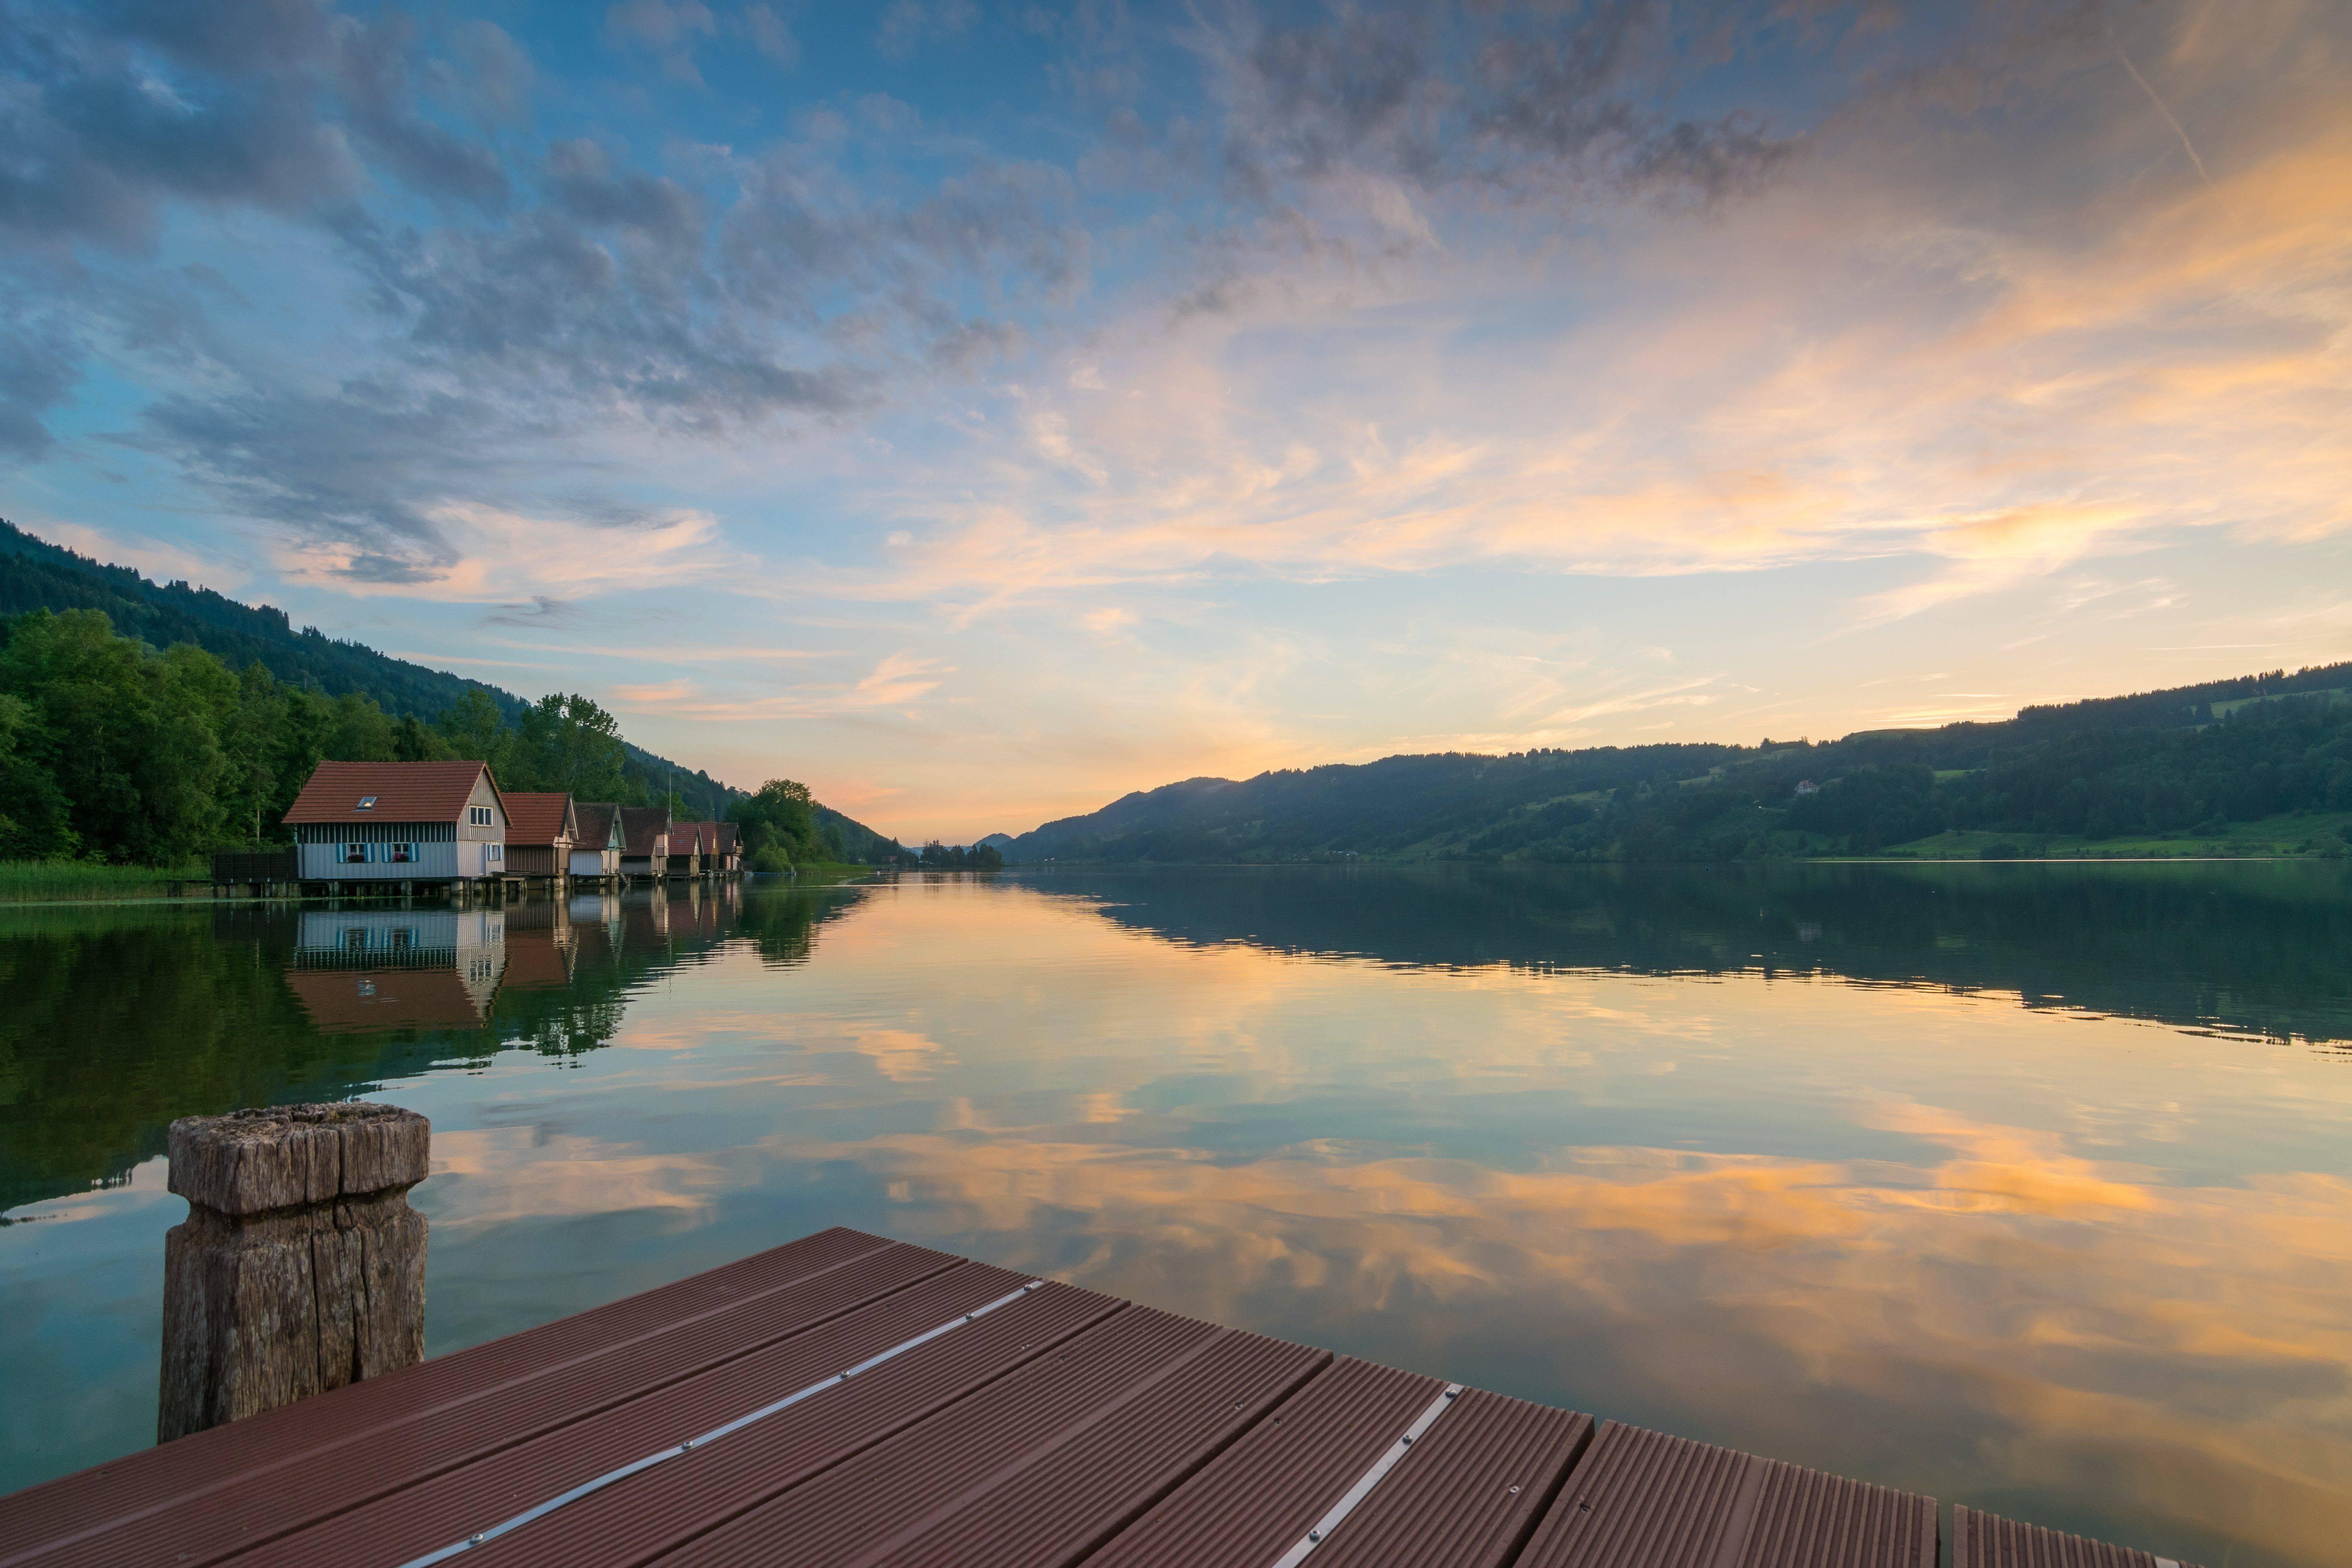 Familienurlaub im Allgäu direkt am Alpsee